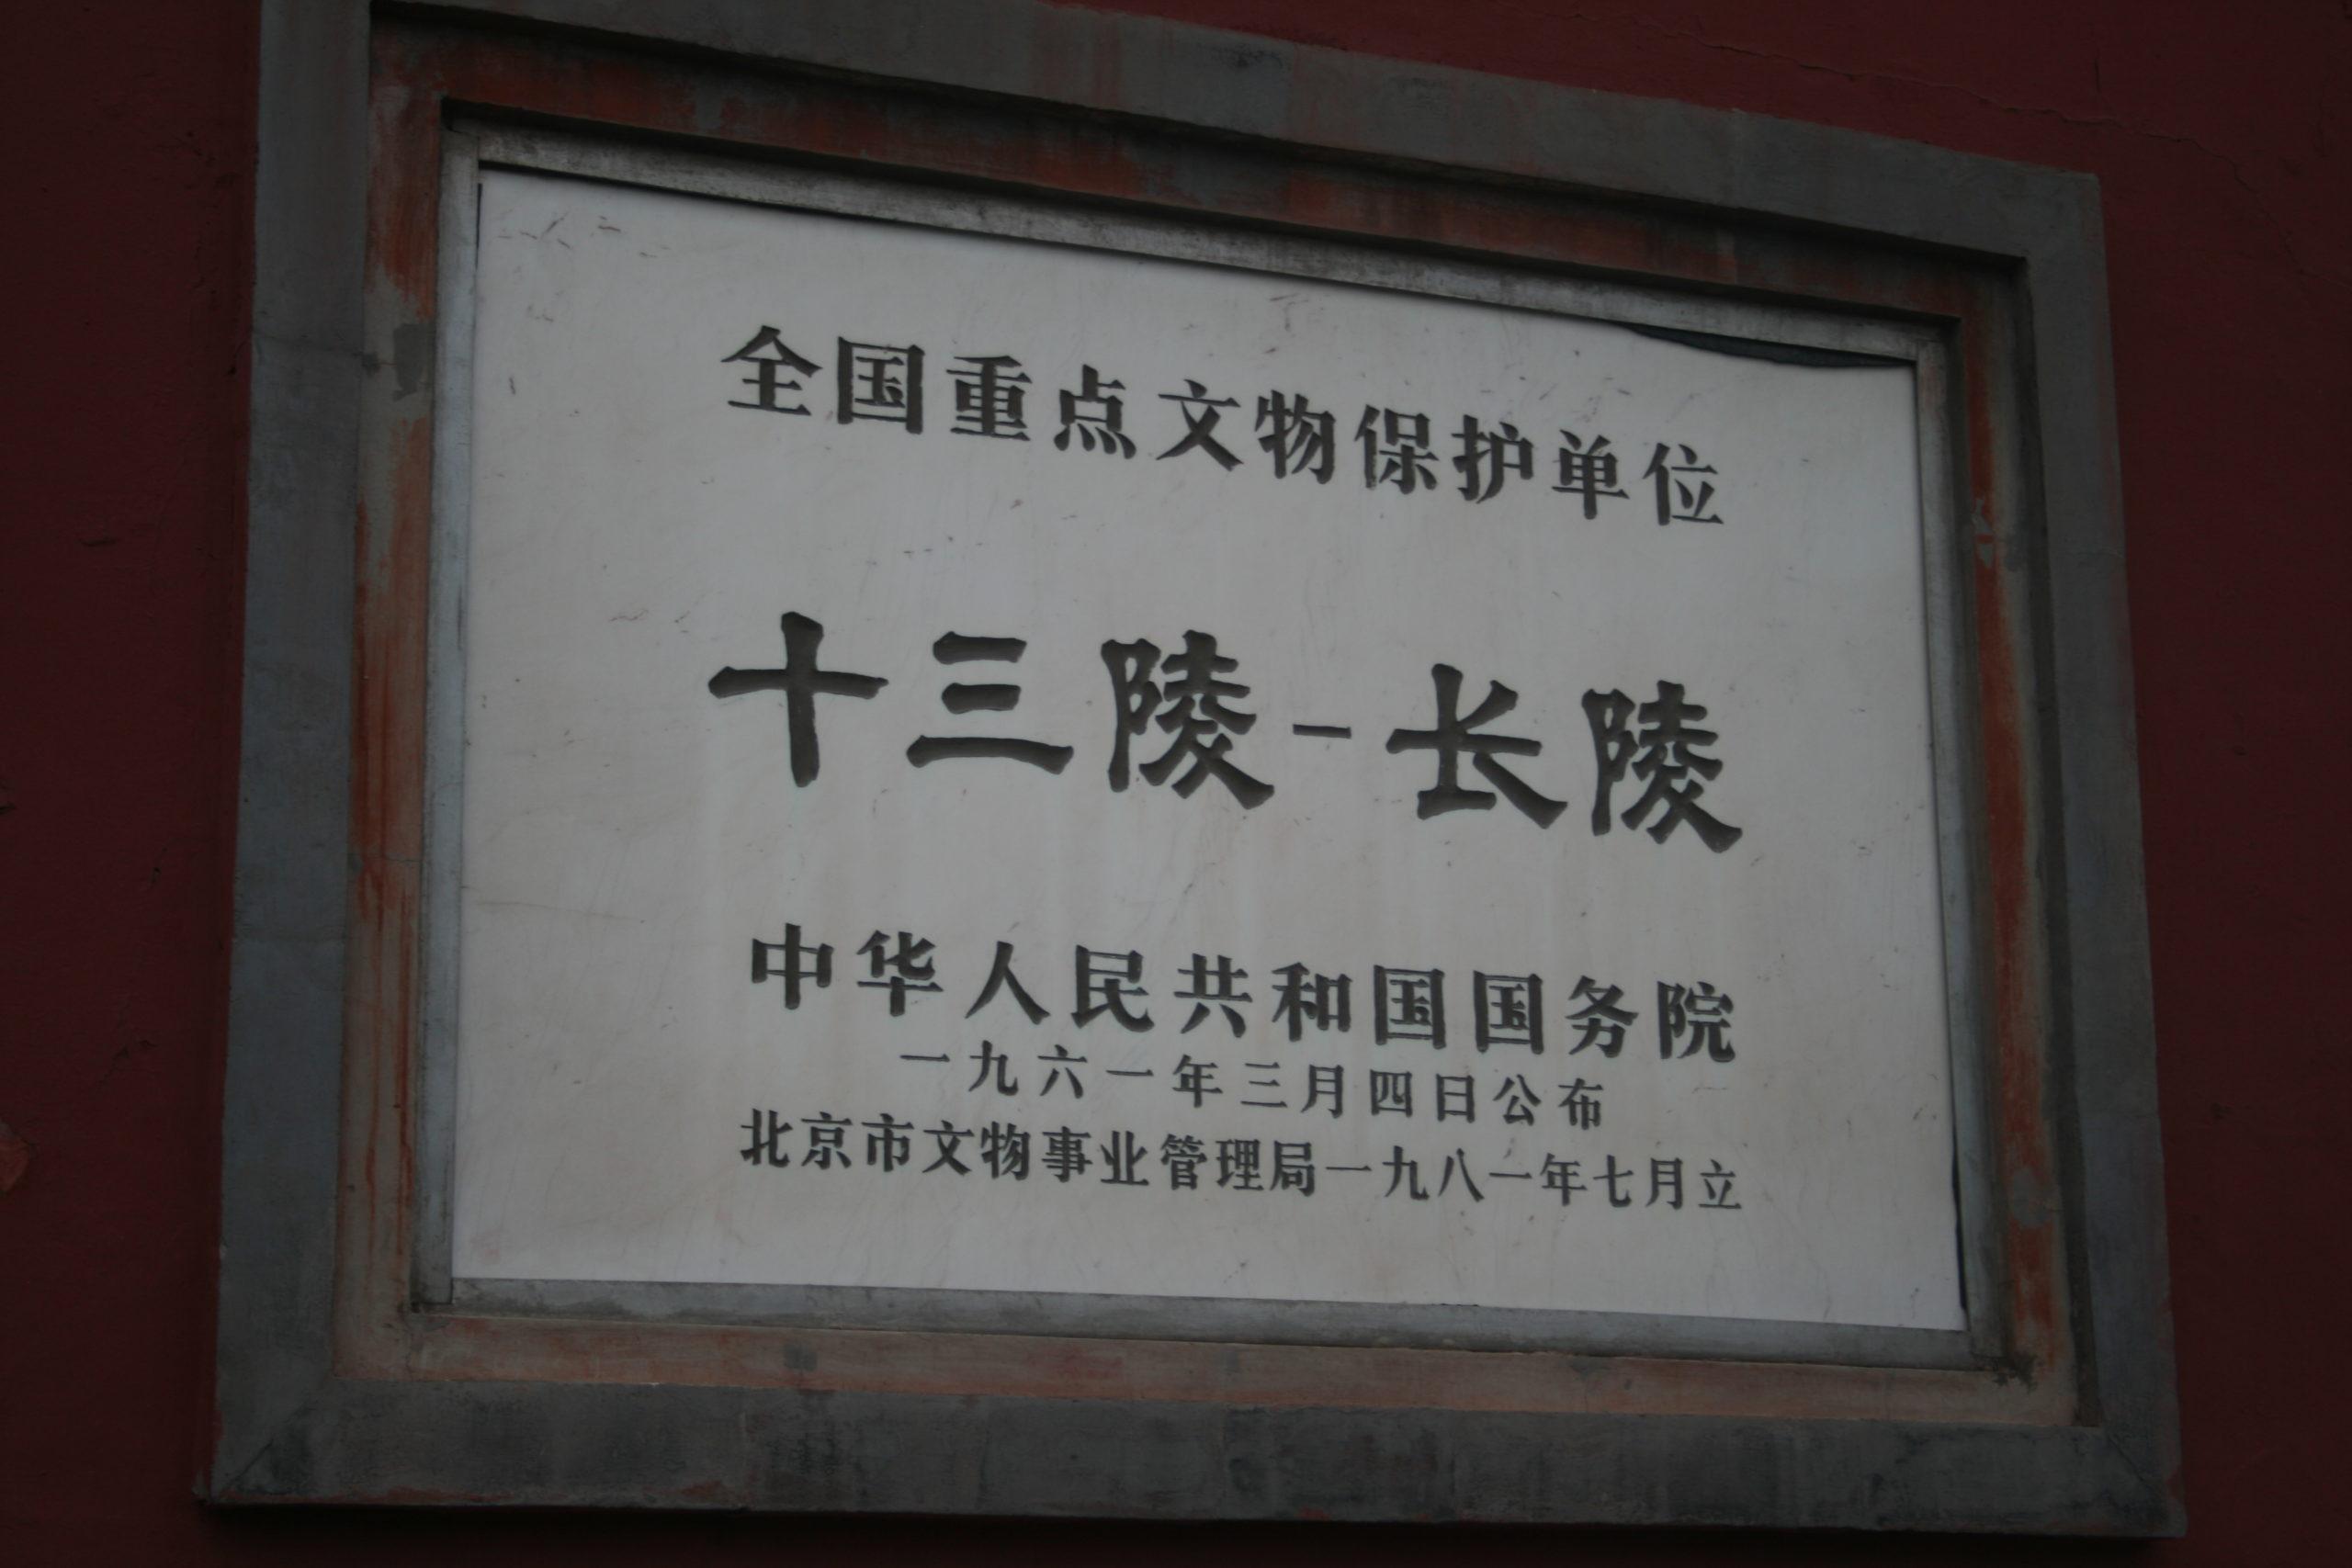 Pancarte écrite en Chinois